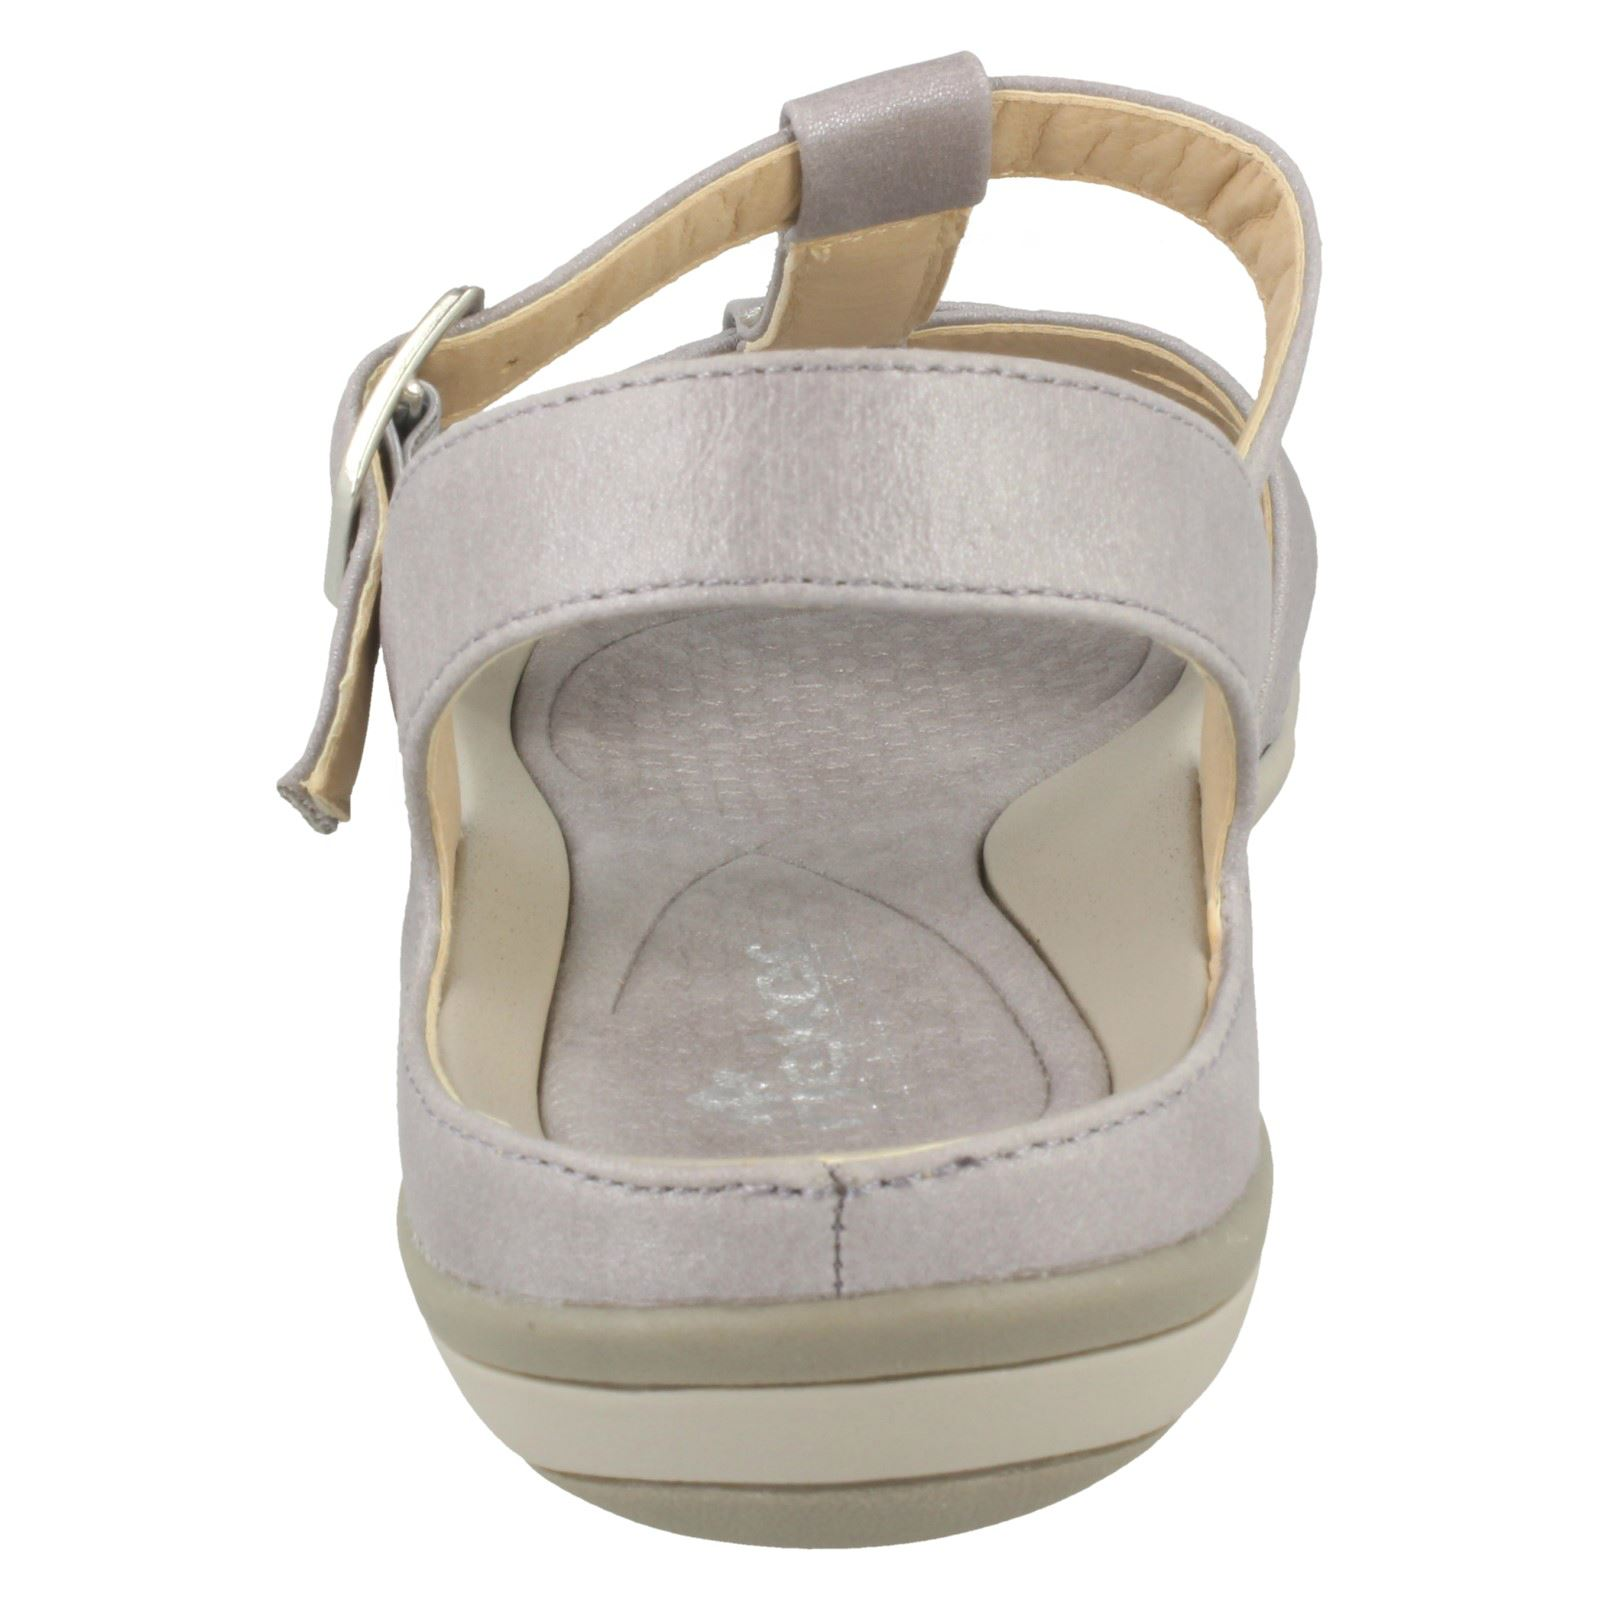 Details about Ladies Rieker Open Toe Buckle Fastening Slingback Summer Sandals 'V9463'